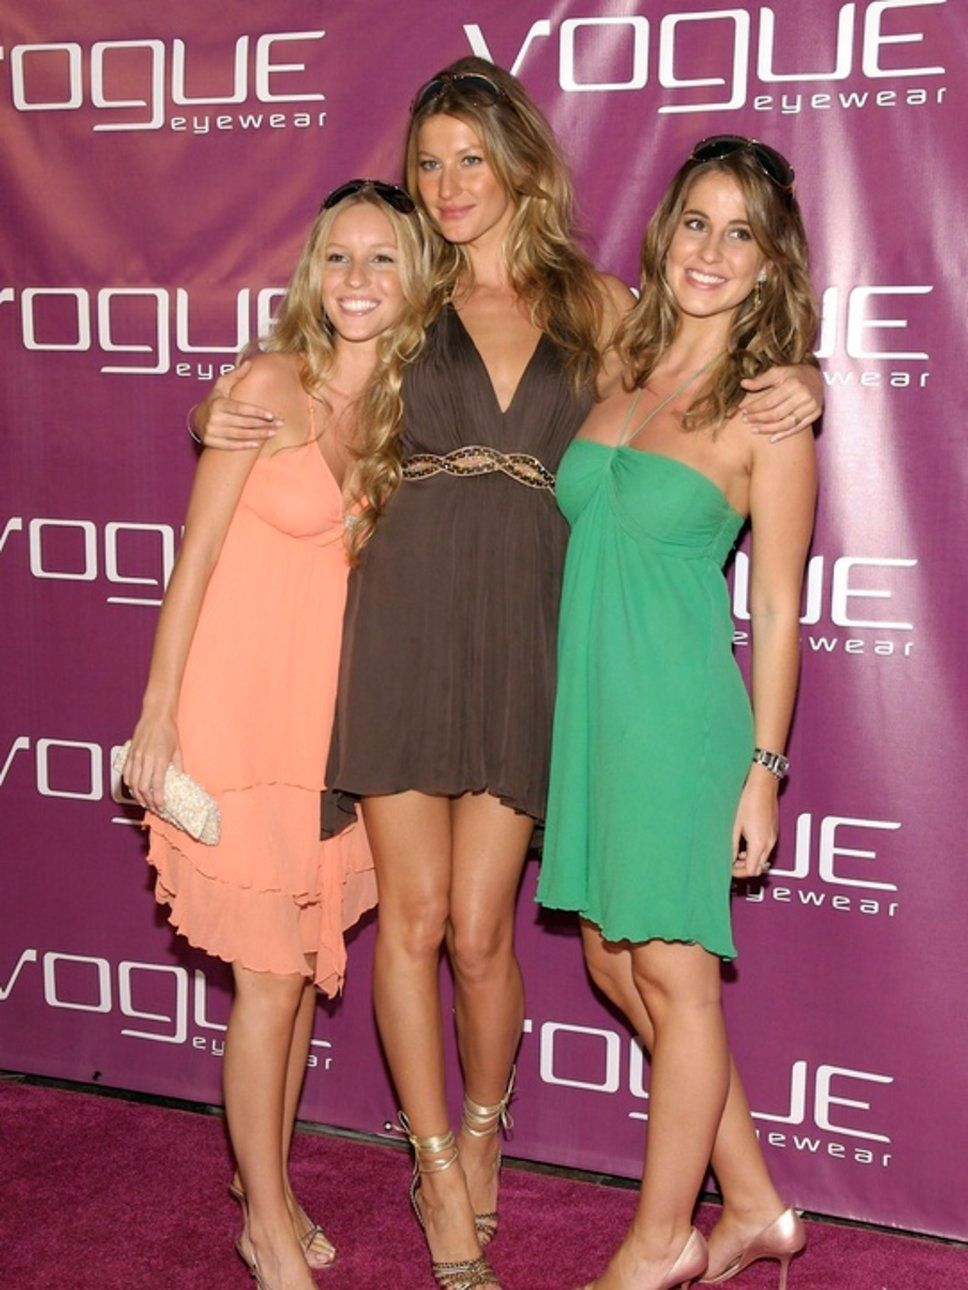 11. Gisele Bundchen and Sisters, Rafaela and Patricia